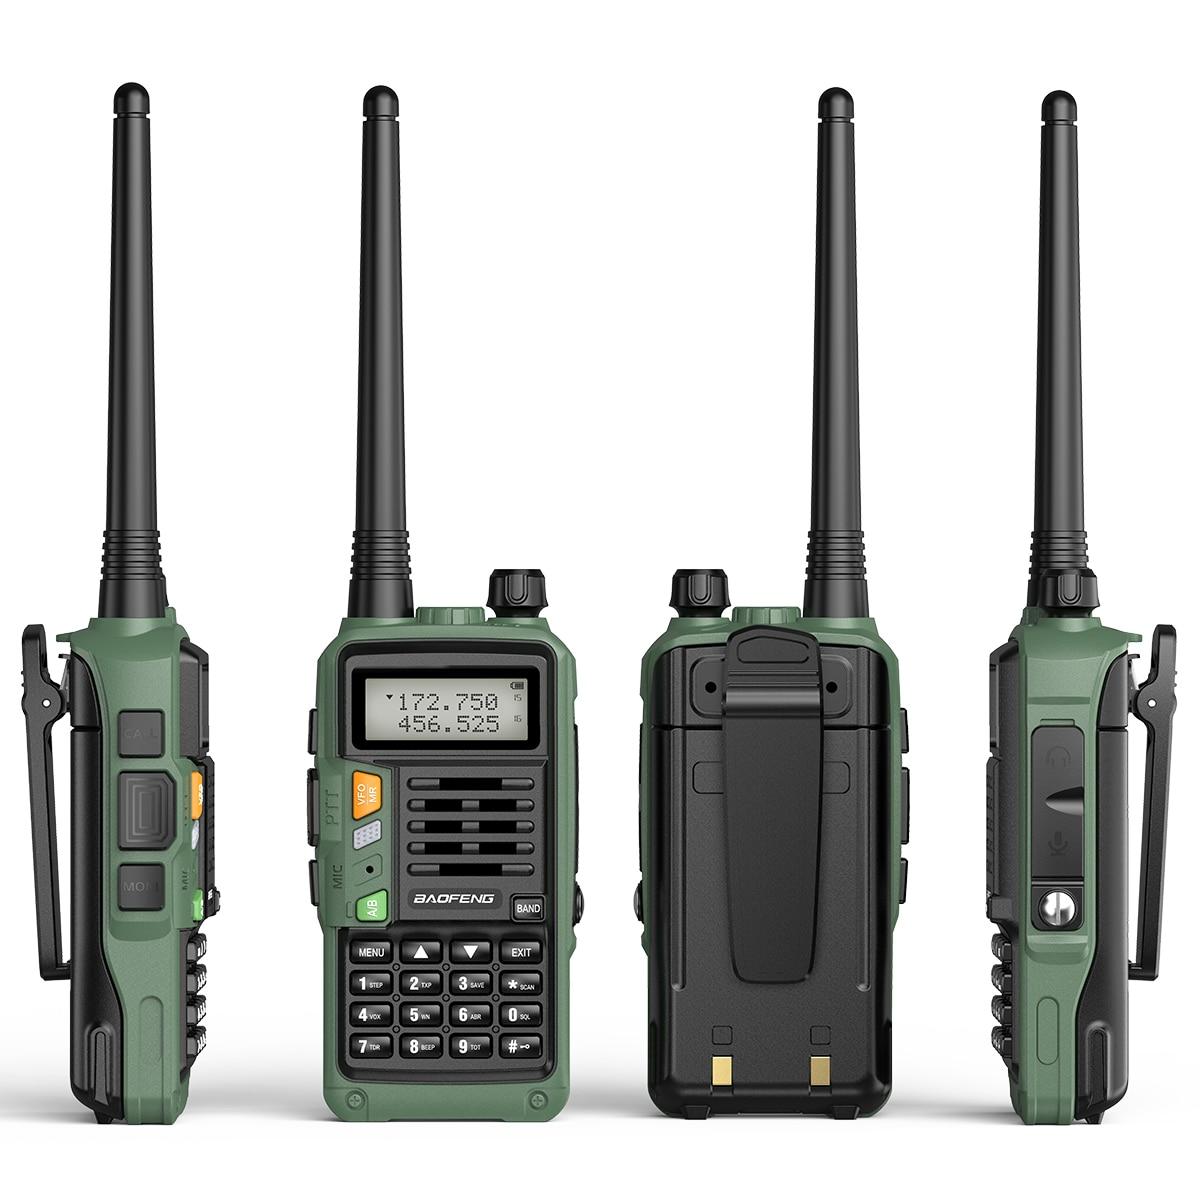 Green BAOFENG UV-S9 Plus 10W Powerful 50KM Handheld Transceiver with UHF VHF Dual Band Walkie Talkie Ham UV-5R Two Way Radio enlarge